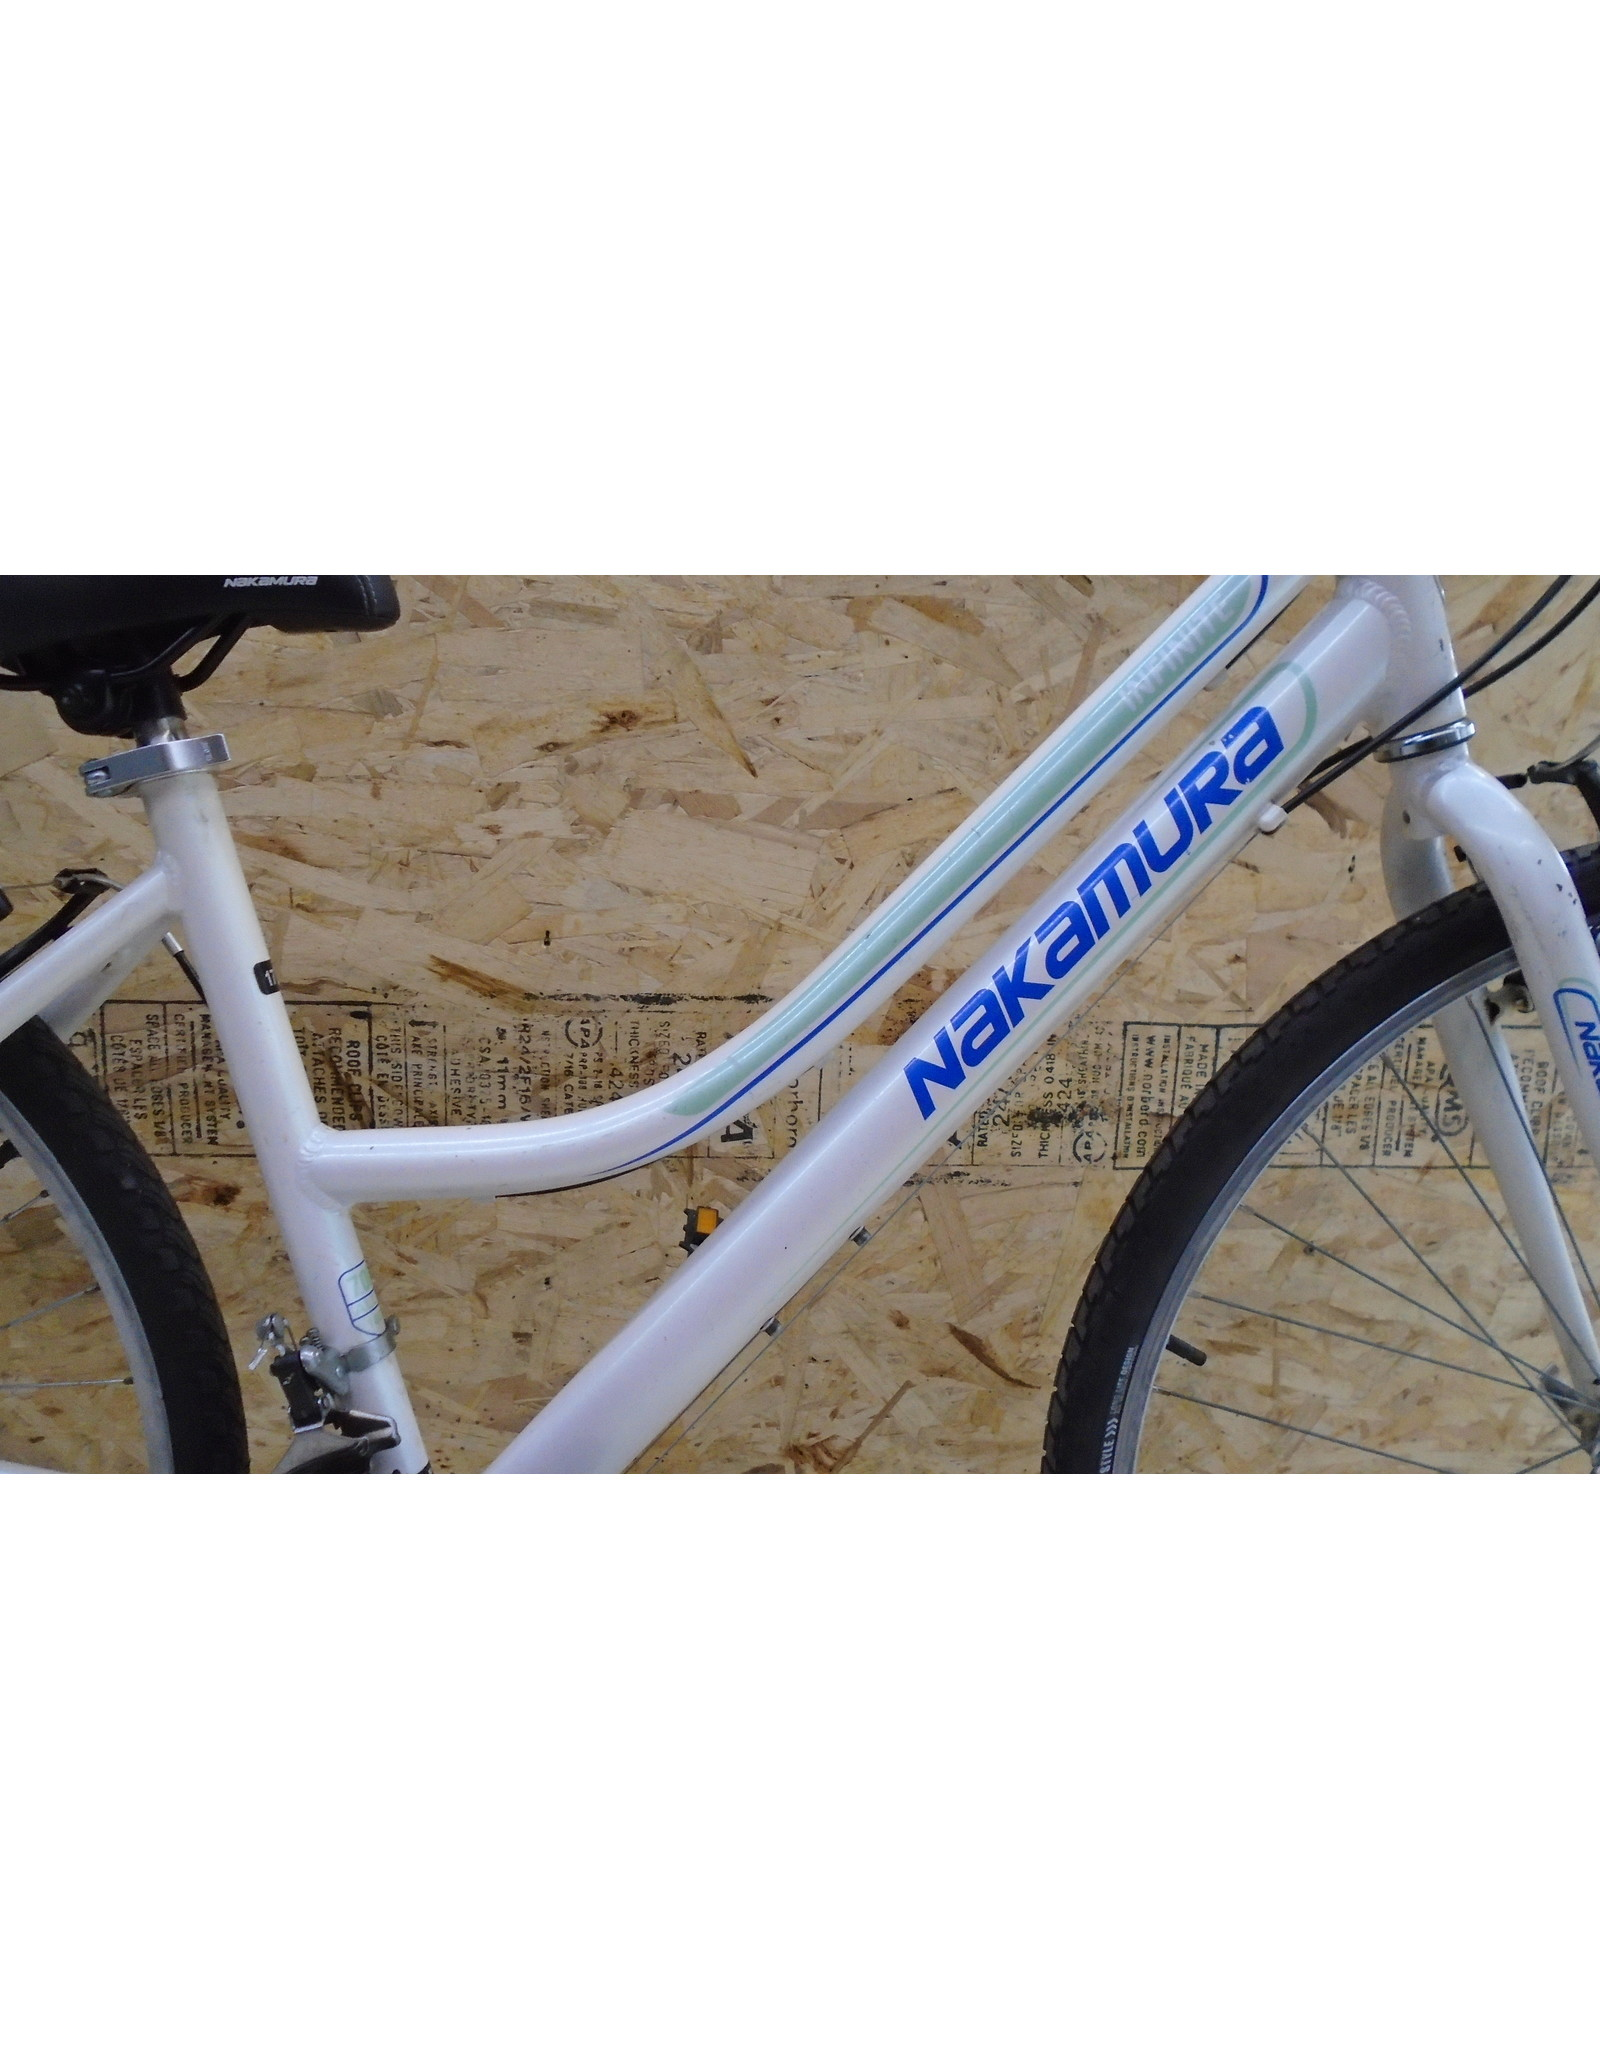 "Vélo usagé hybride Nakamura 17"" - 10419"